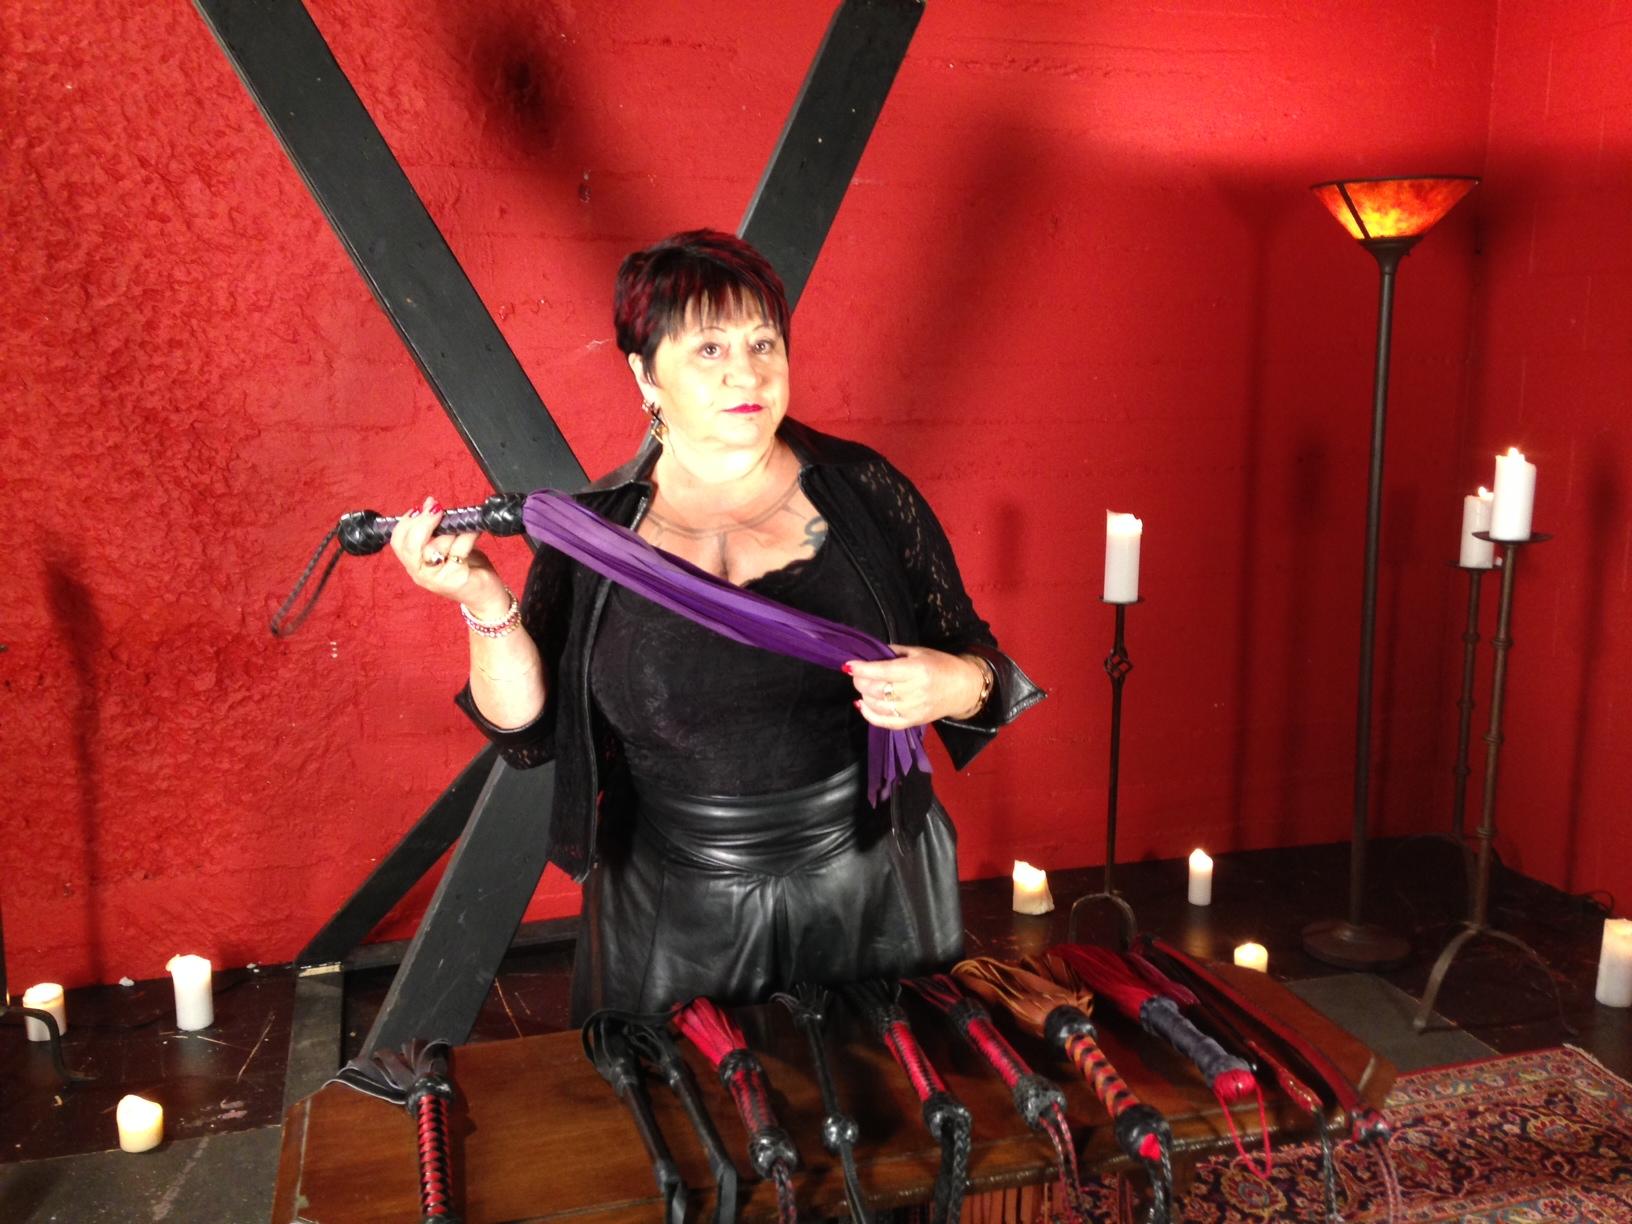 Bdsm Flogging Videos 13